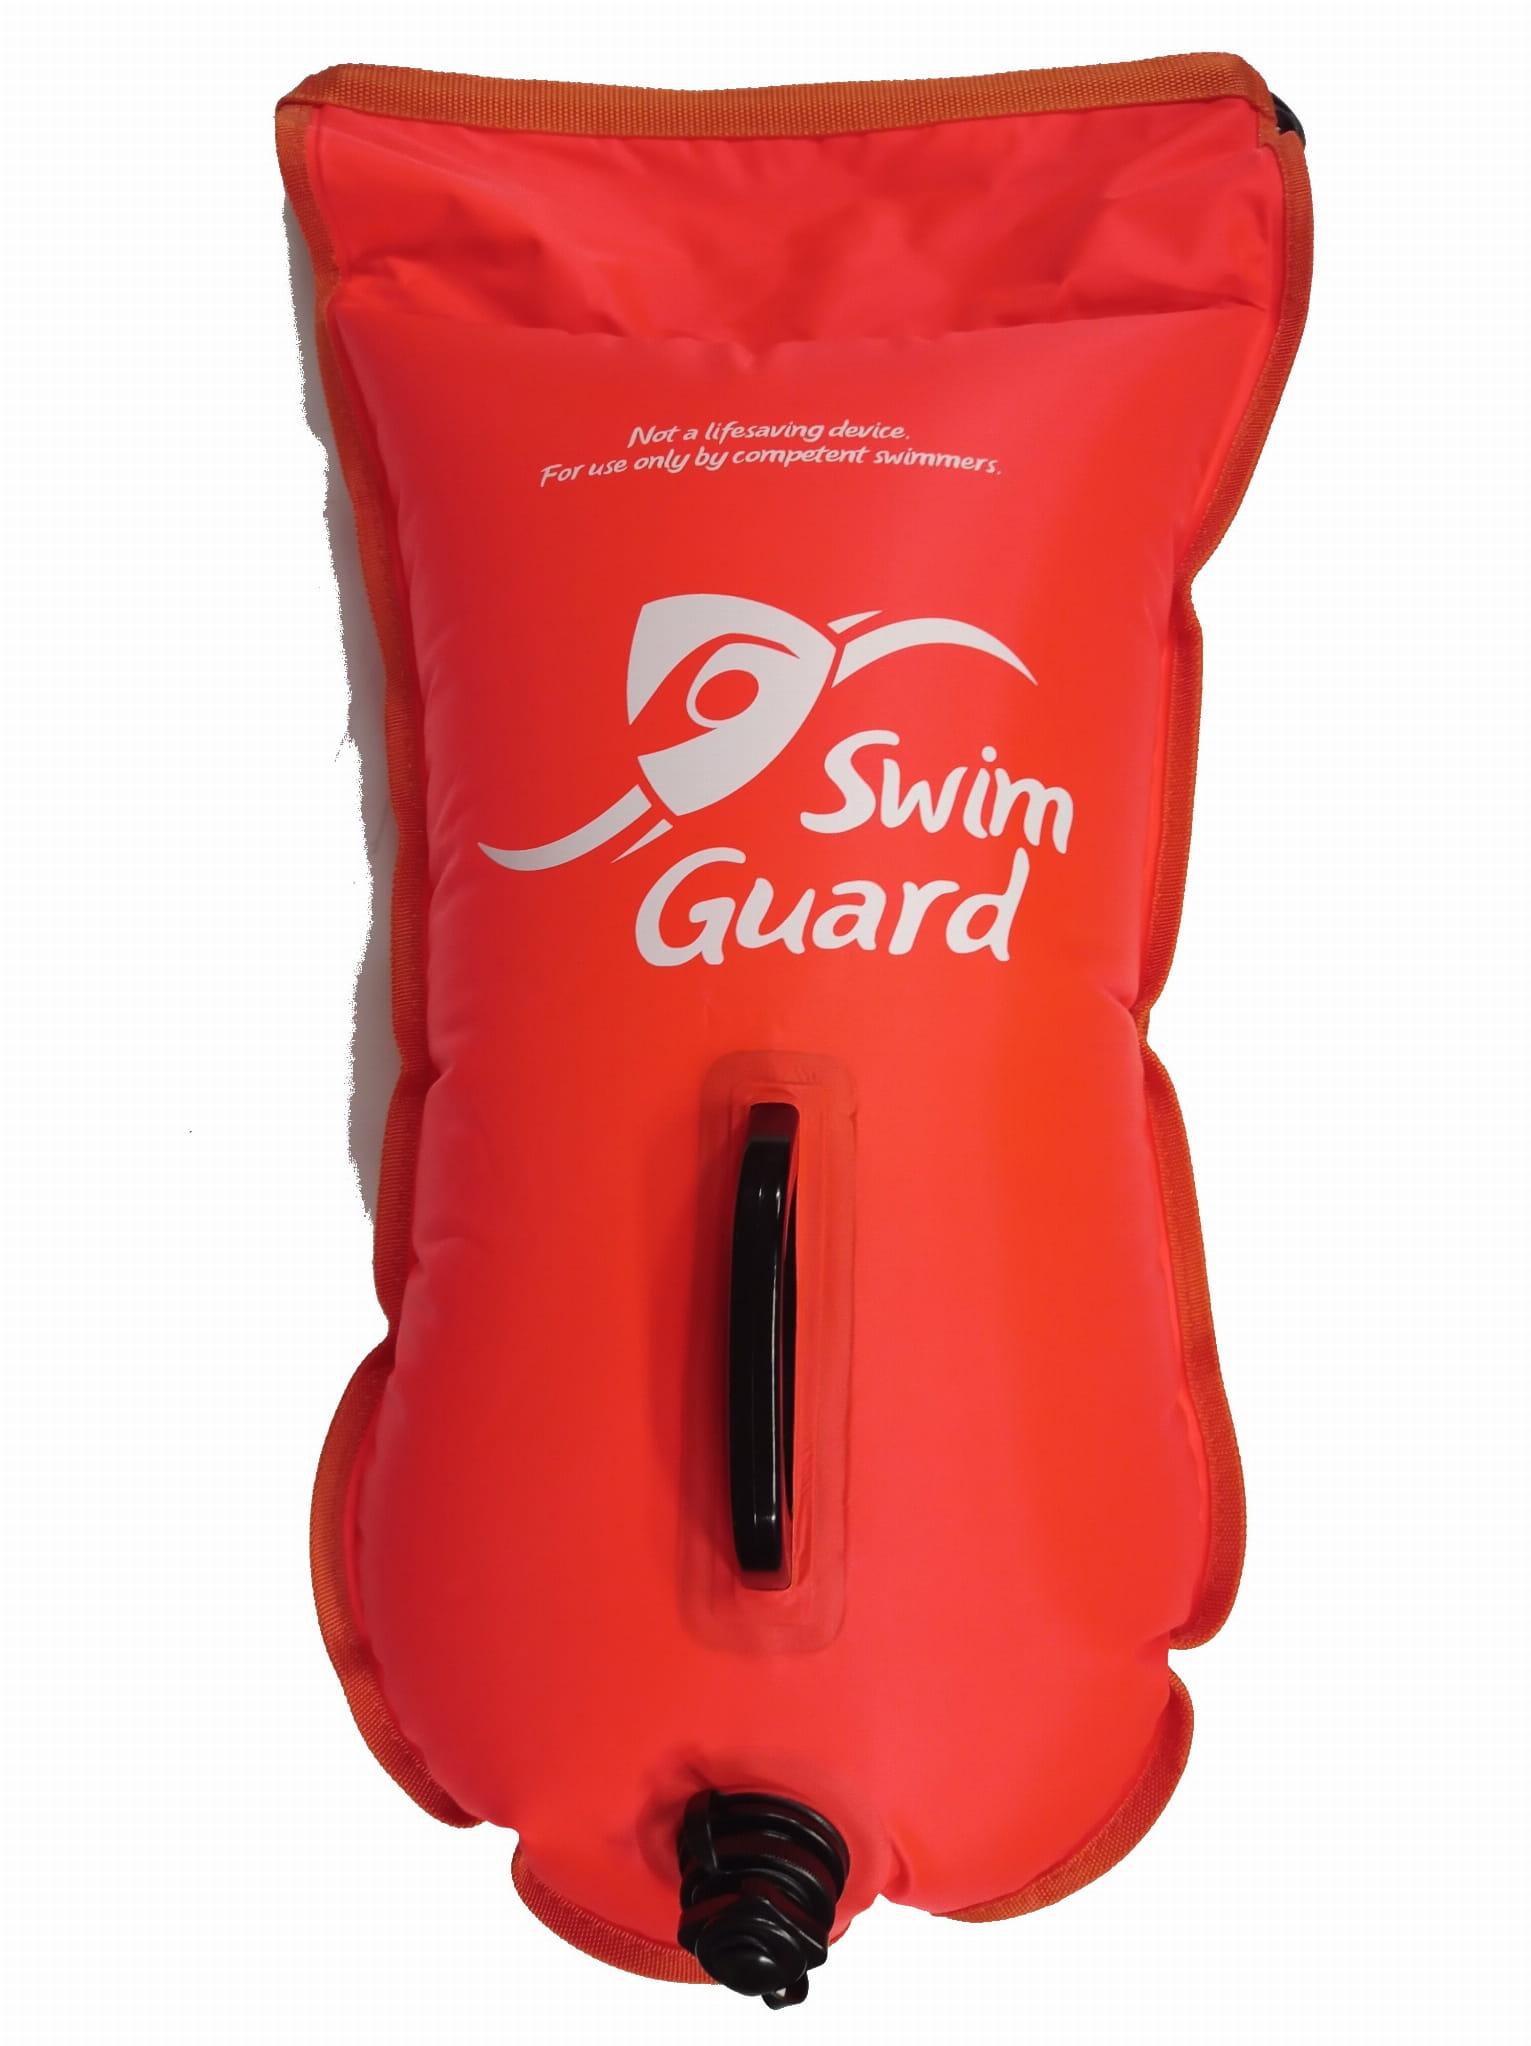 Bojka asekuracyjna dwukomorowa Swim Guard boja